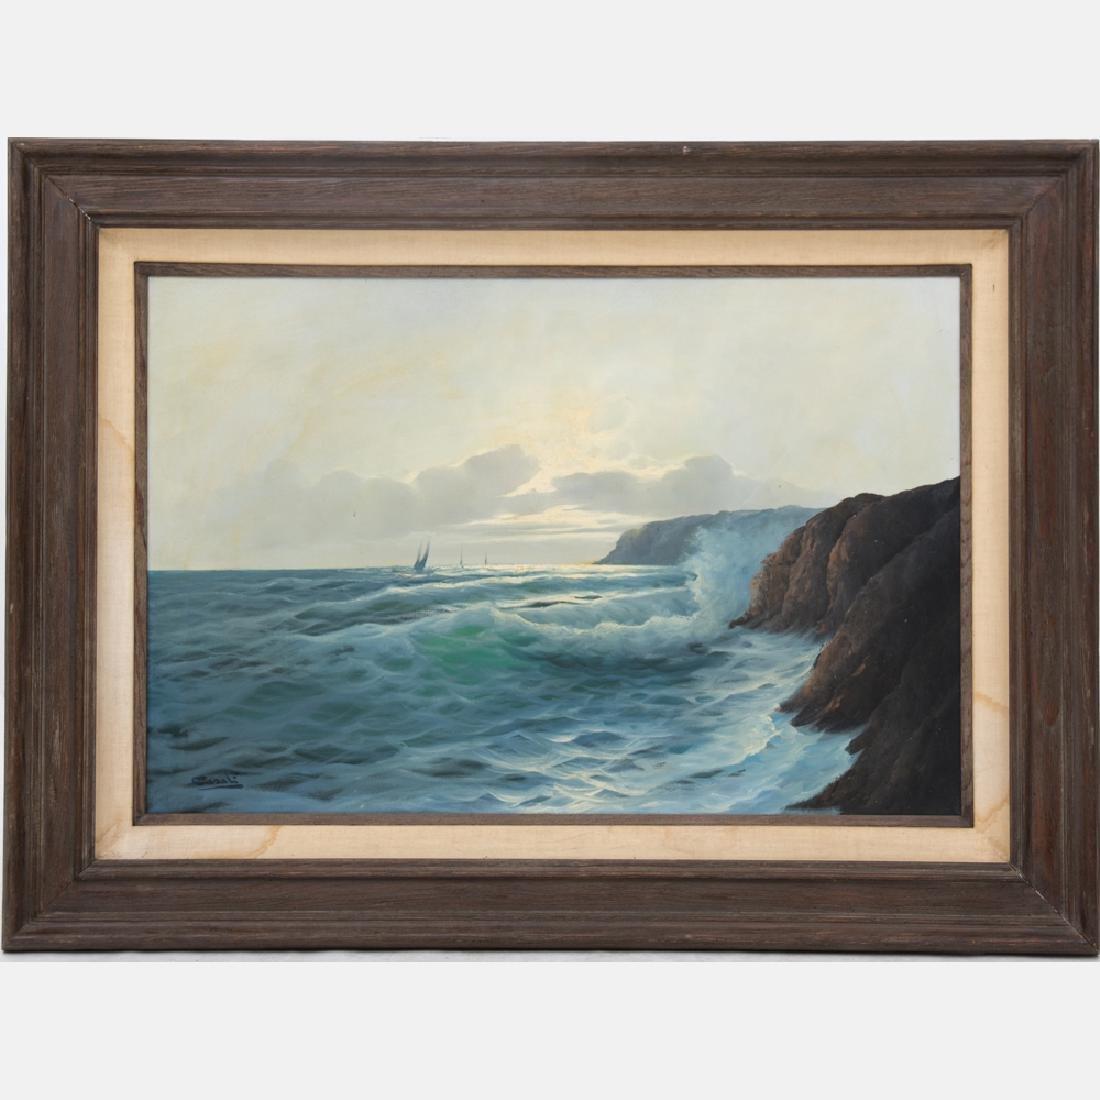 Carlo Casati (1889-1965) Coastal Scene, Oil on canvas,